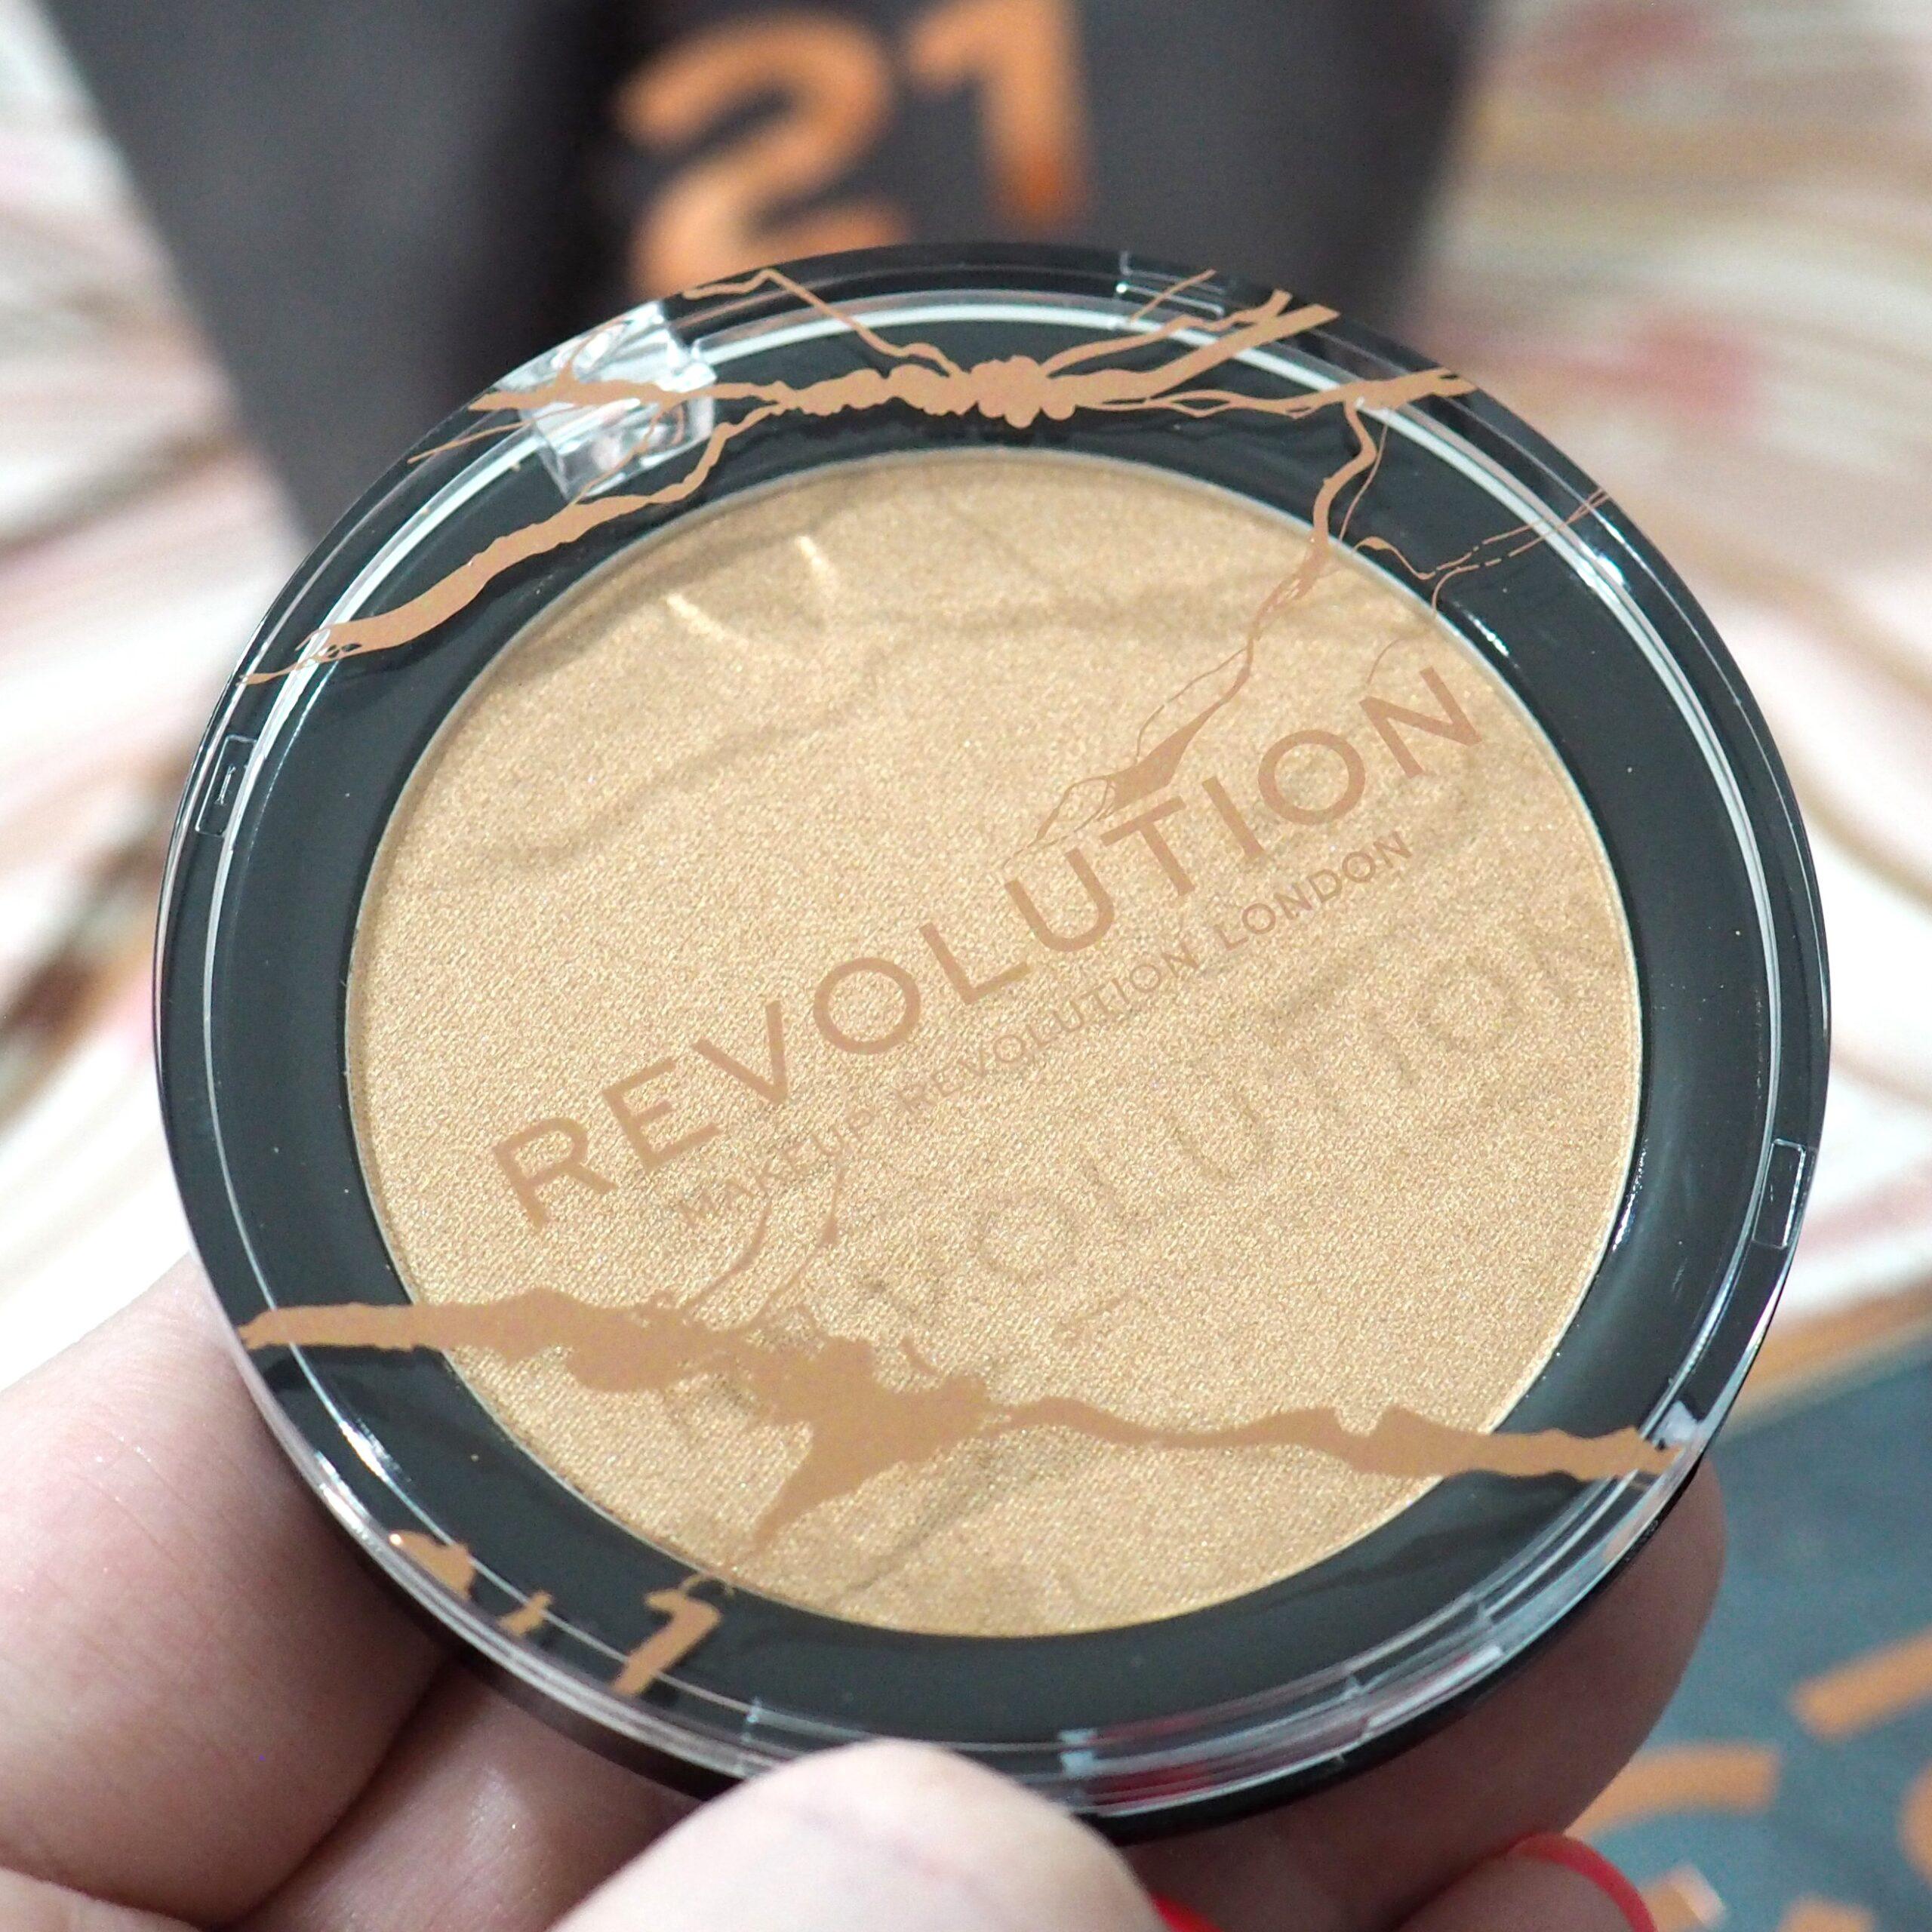 Revolution Deluxe Advent Calendar 2021